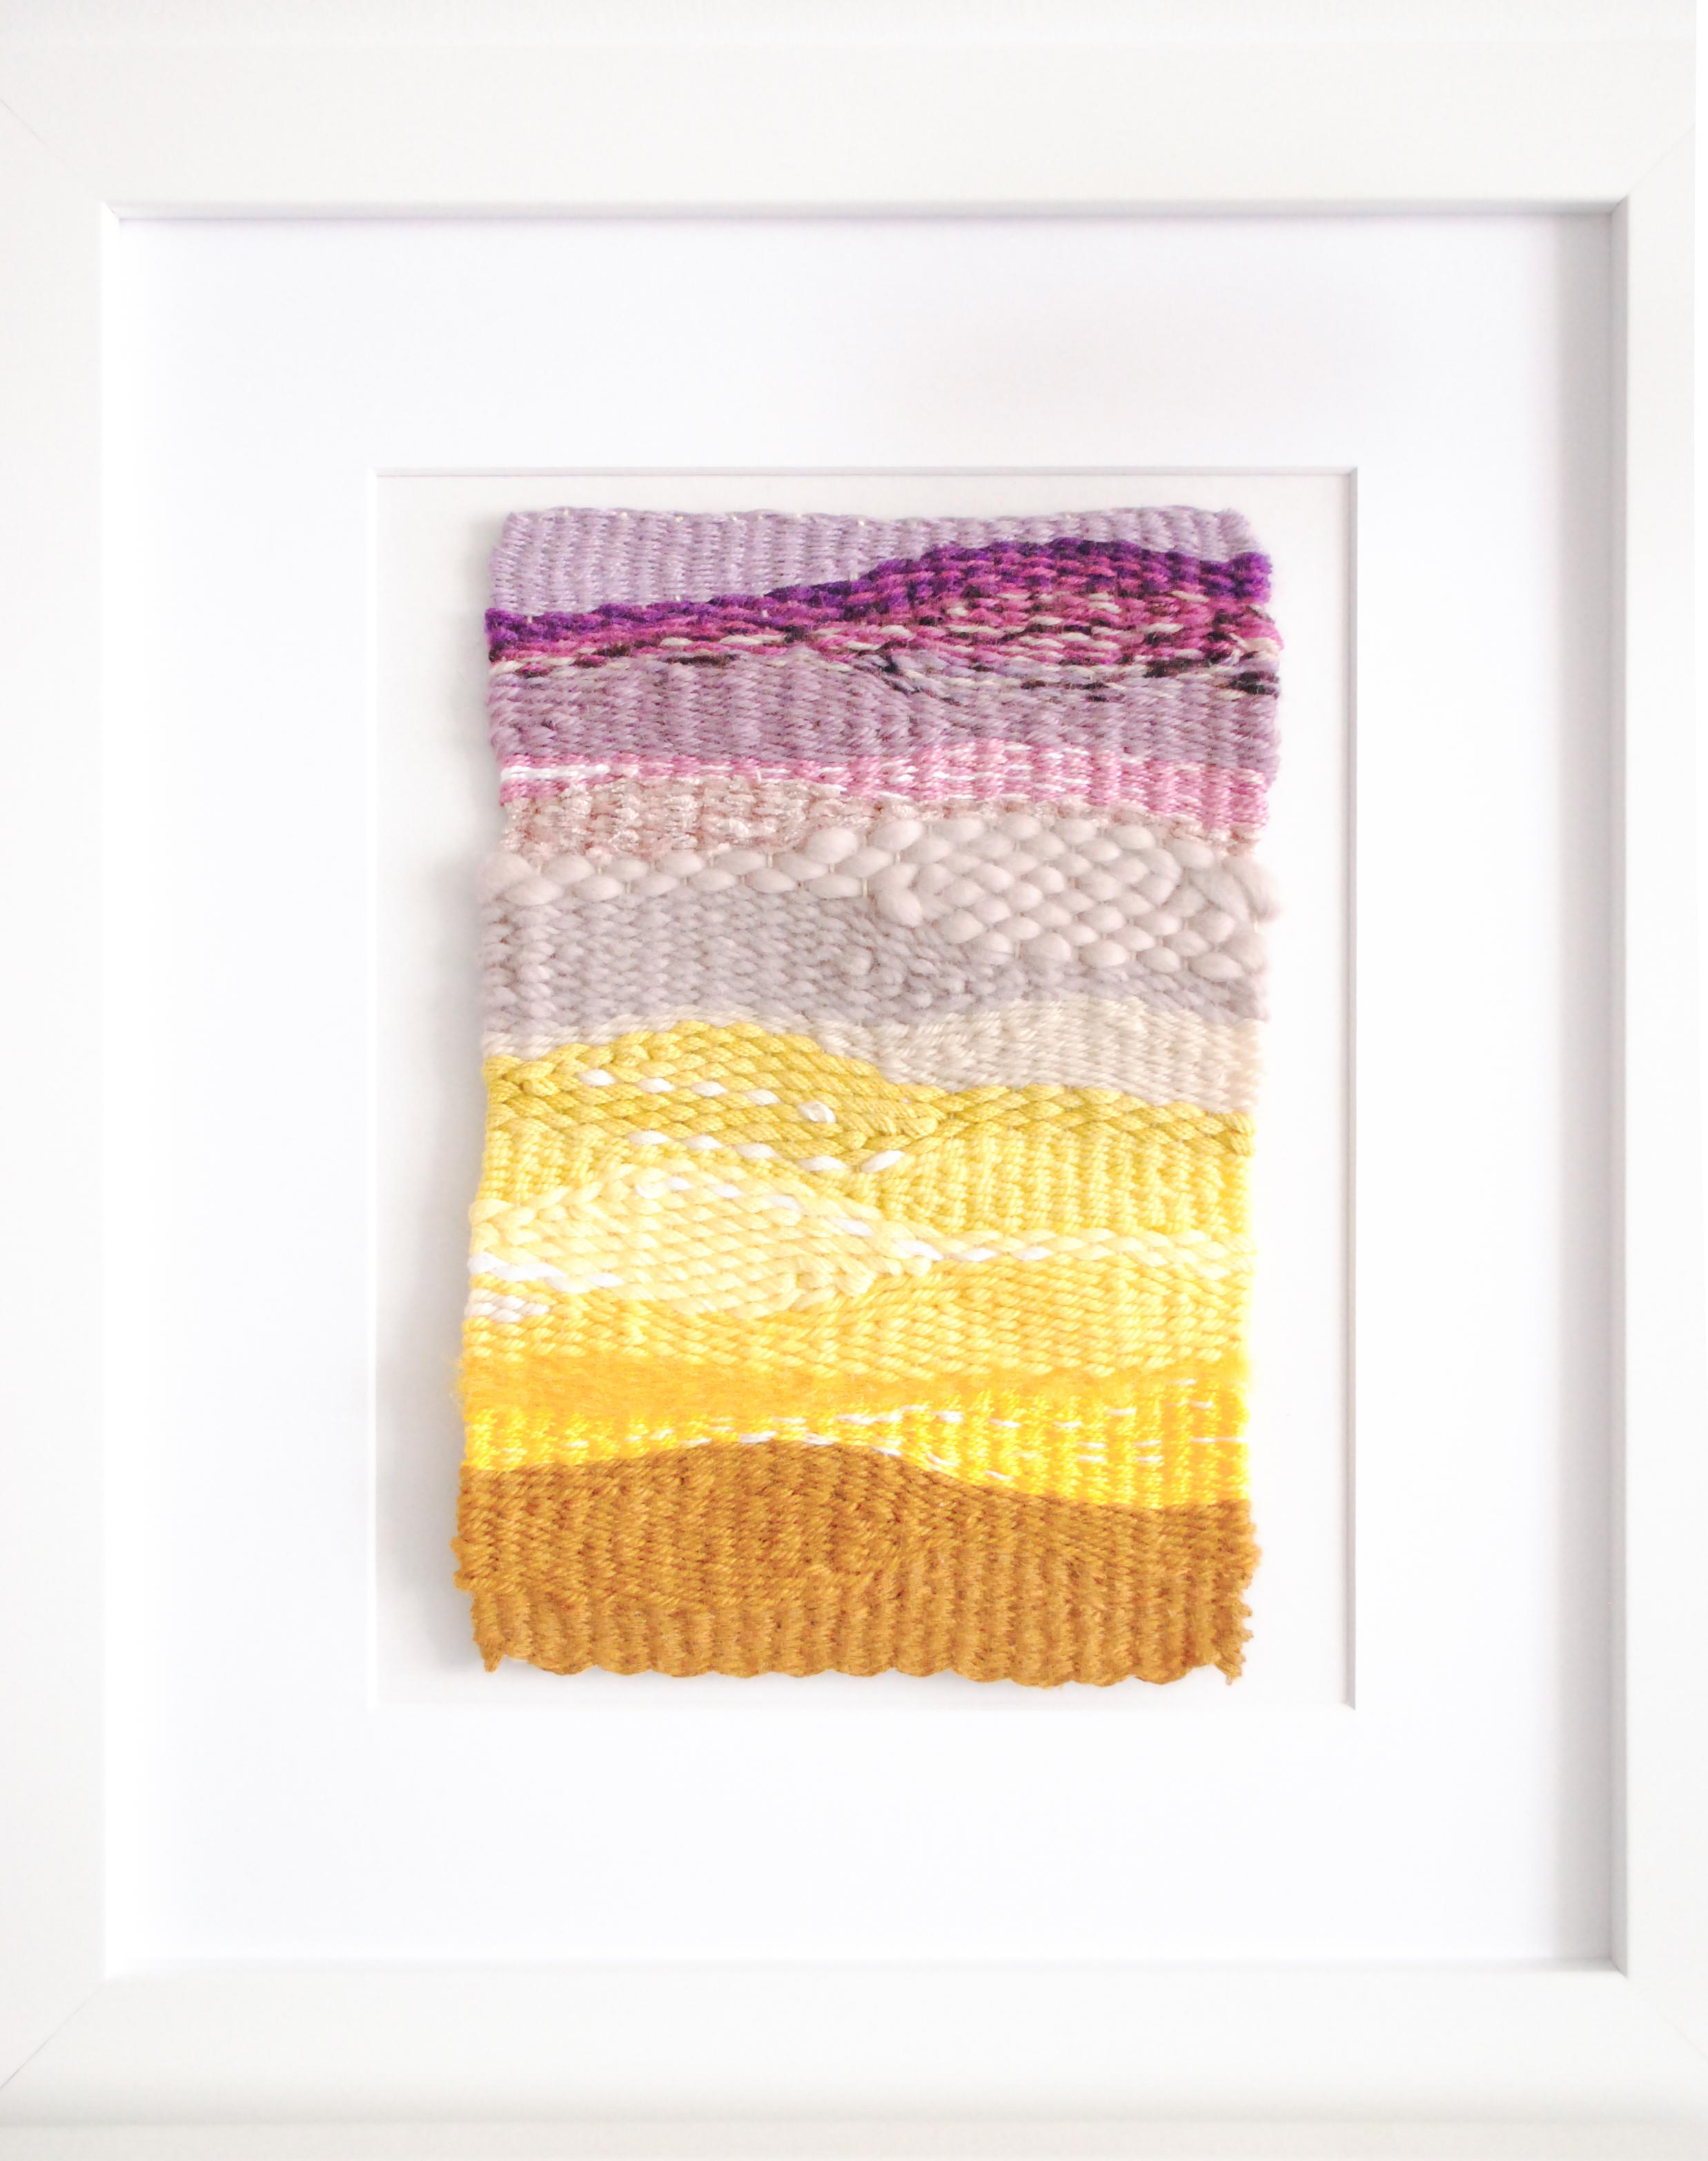 WEGATHER_Handwoven_SmallArtObject_Weaving_PurpleGold.JPG